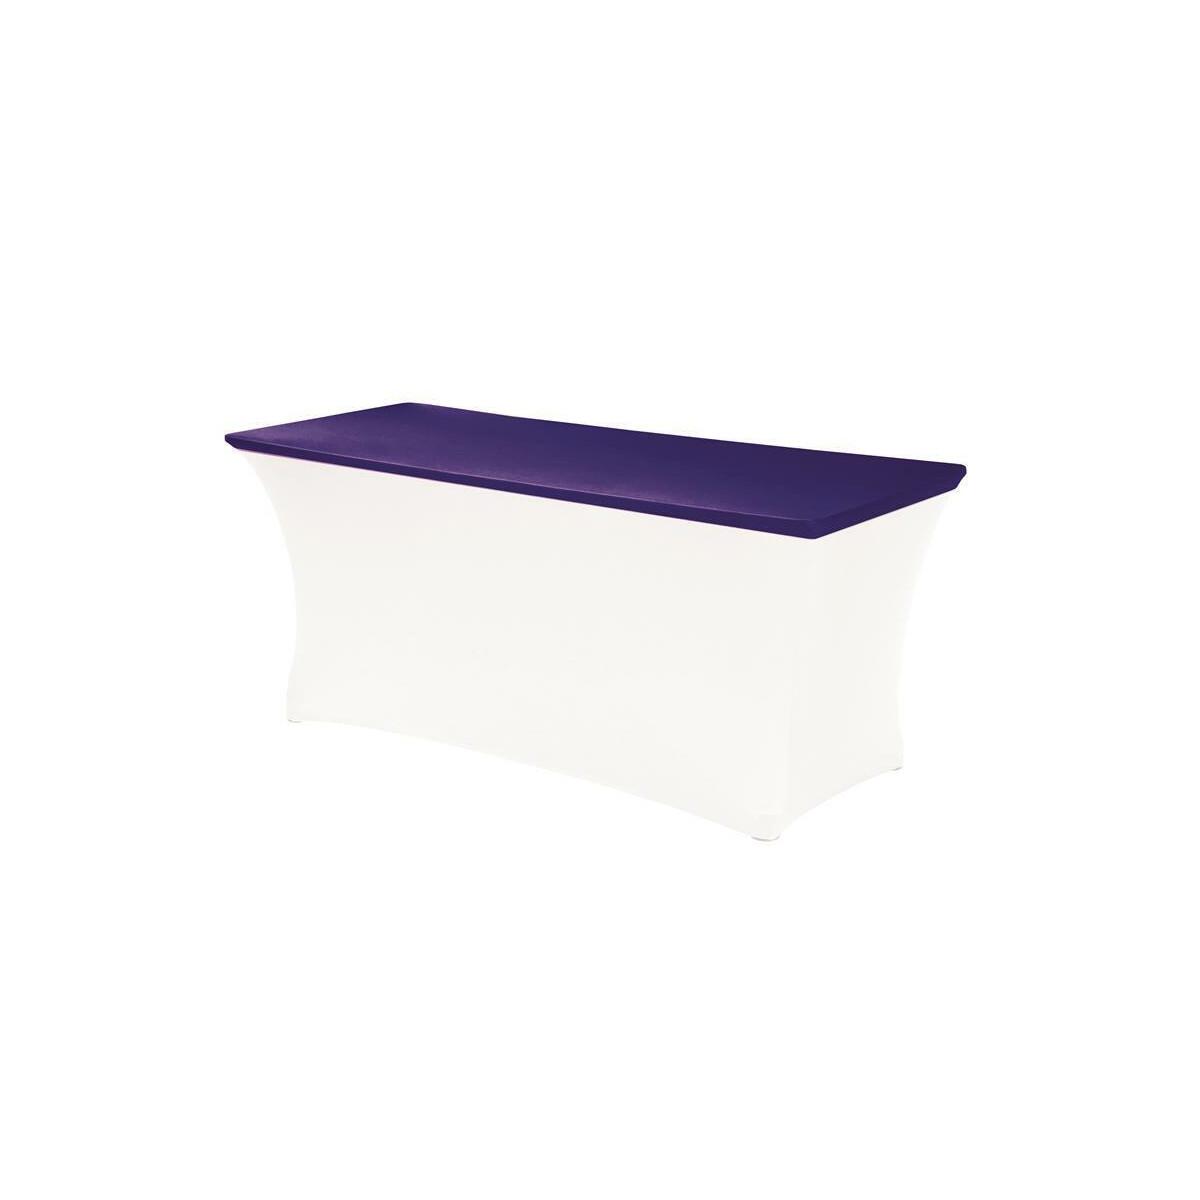 expand budget tischplattenbezug schonbezug stretch f r 183cm tische table topper blau. Black Bedroom Furniture Sets. Home Design Ideas